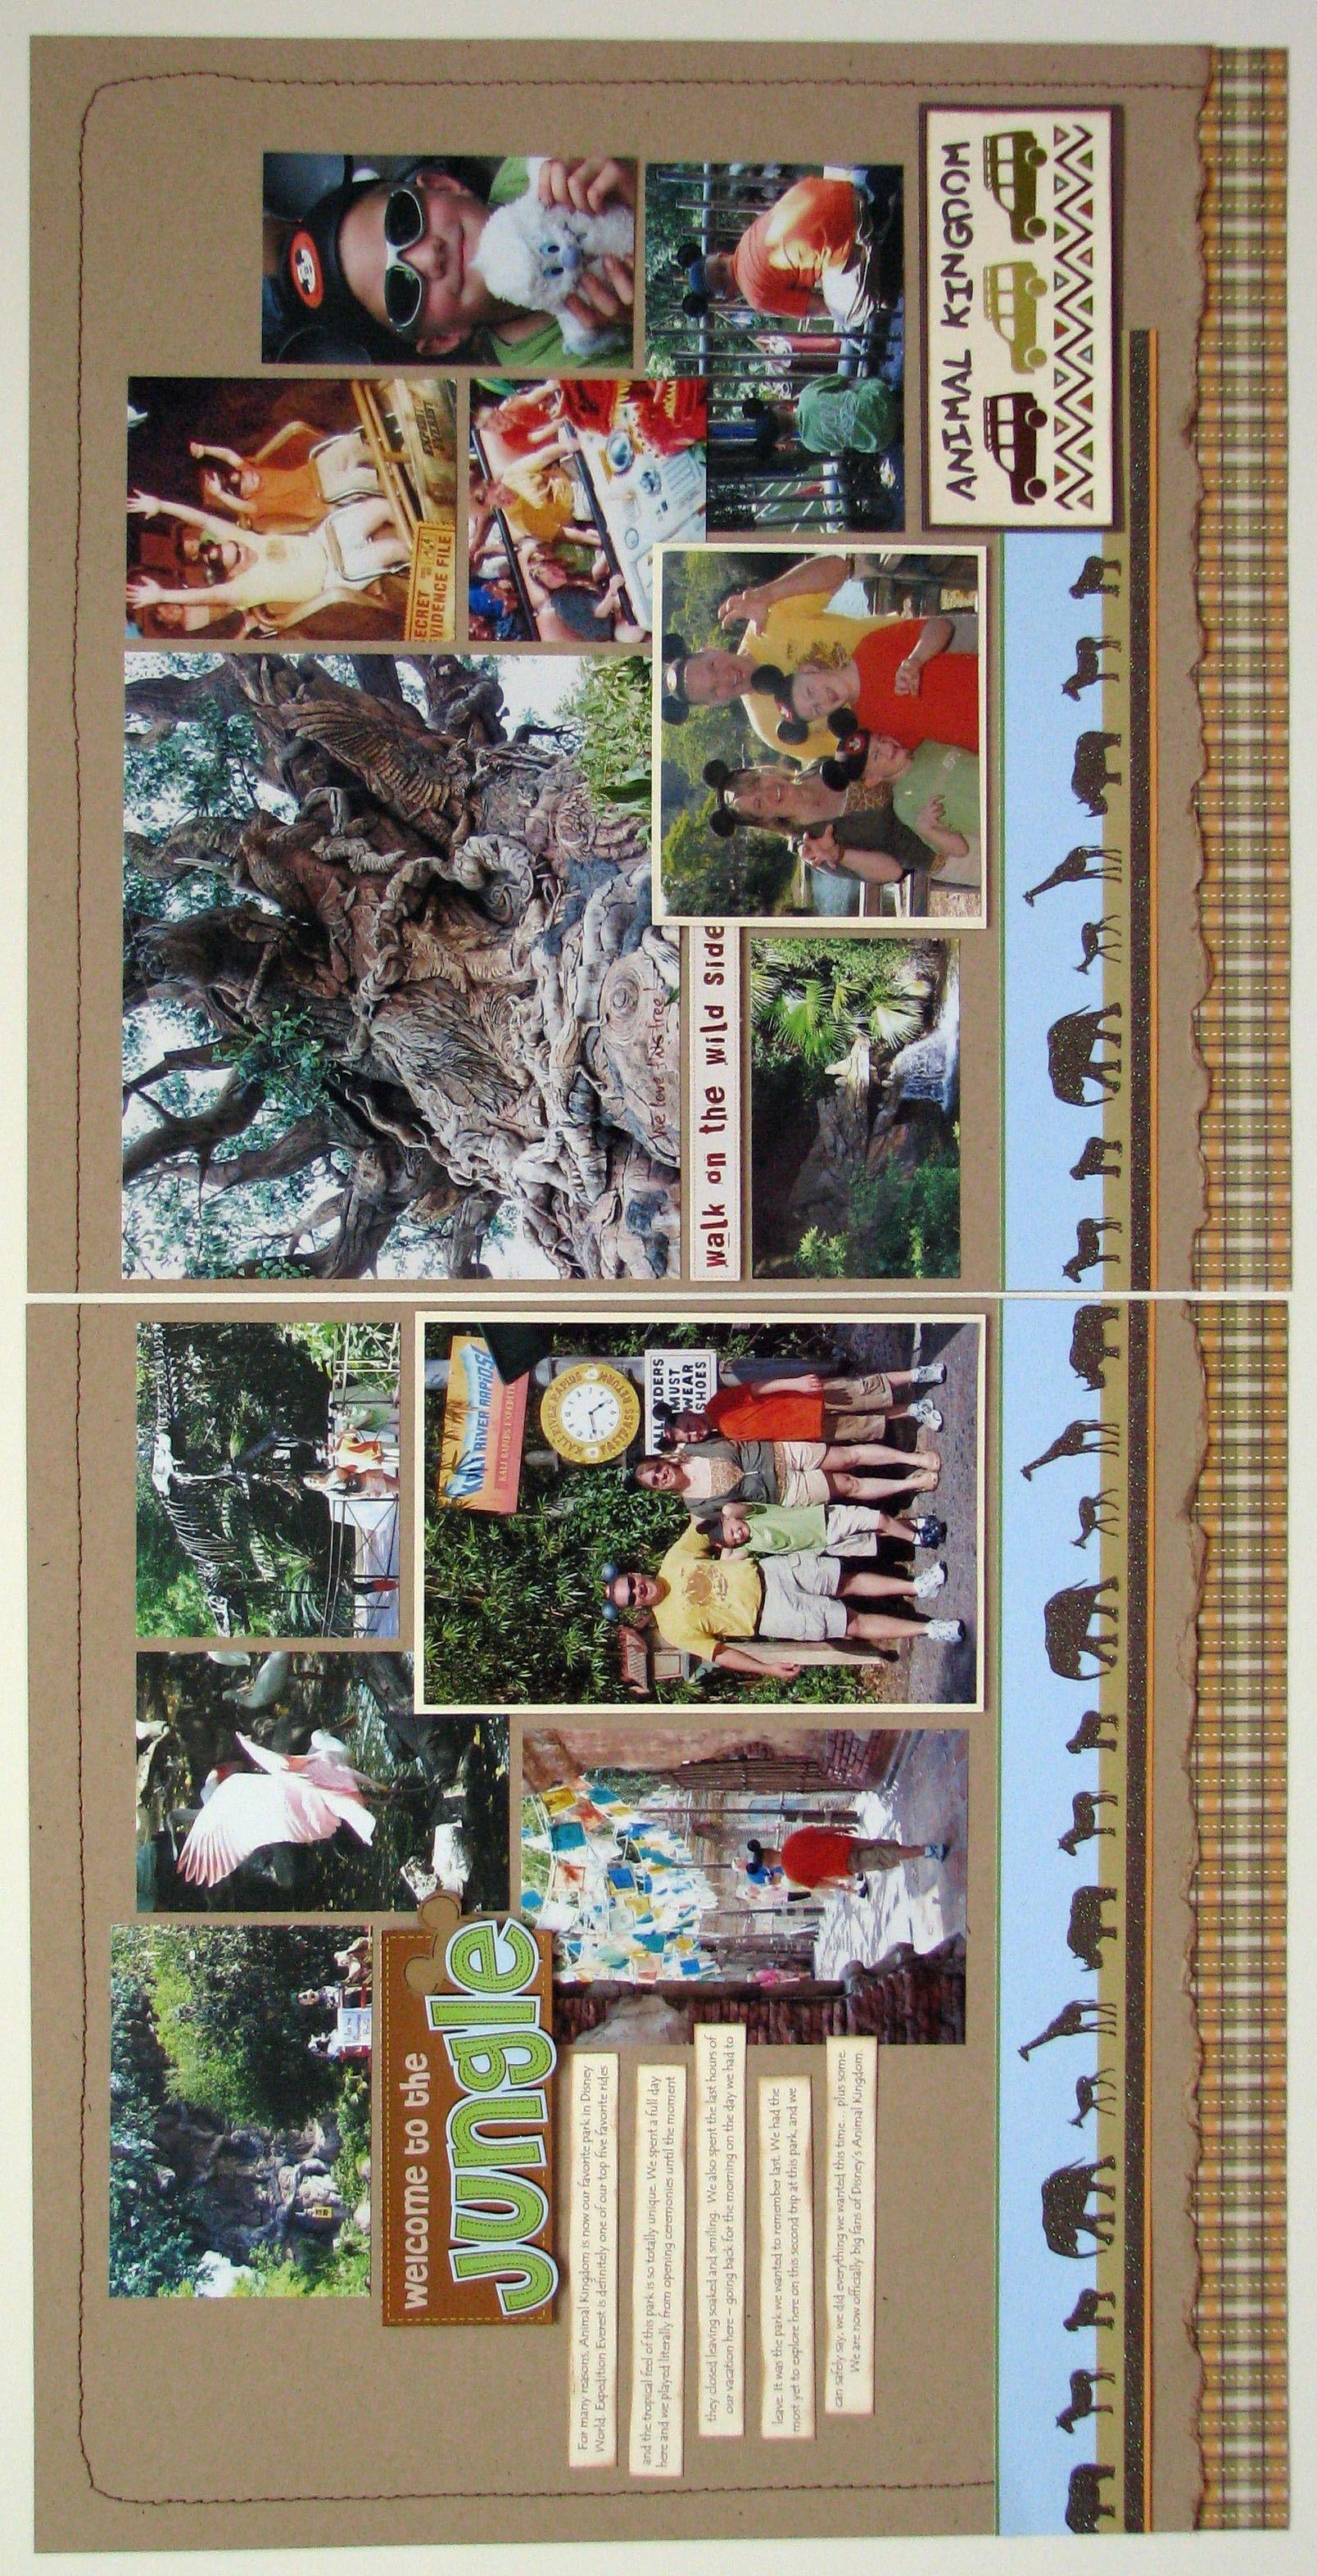 Jungle scrapbook ideas - Welcome To The Jungle Scrapbook Com